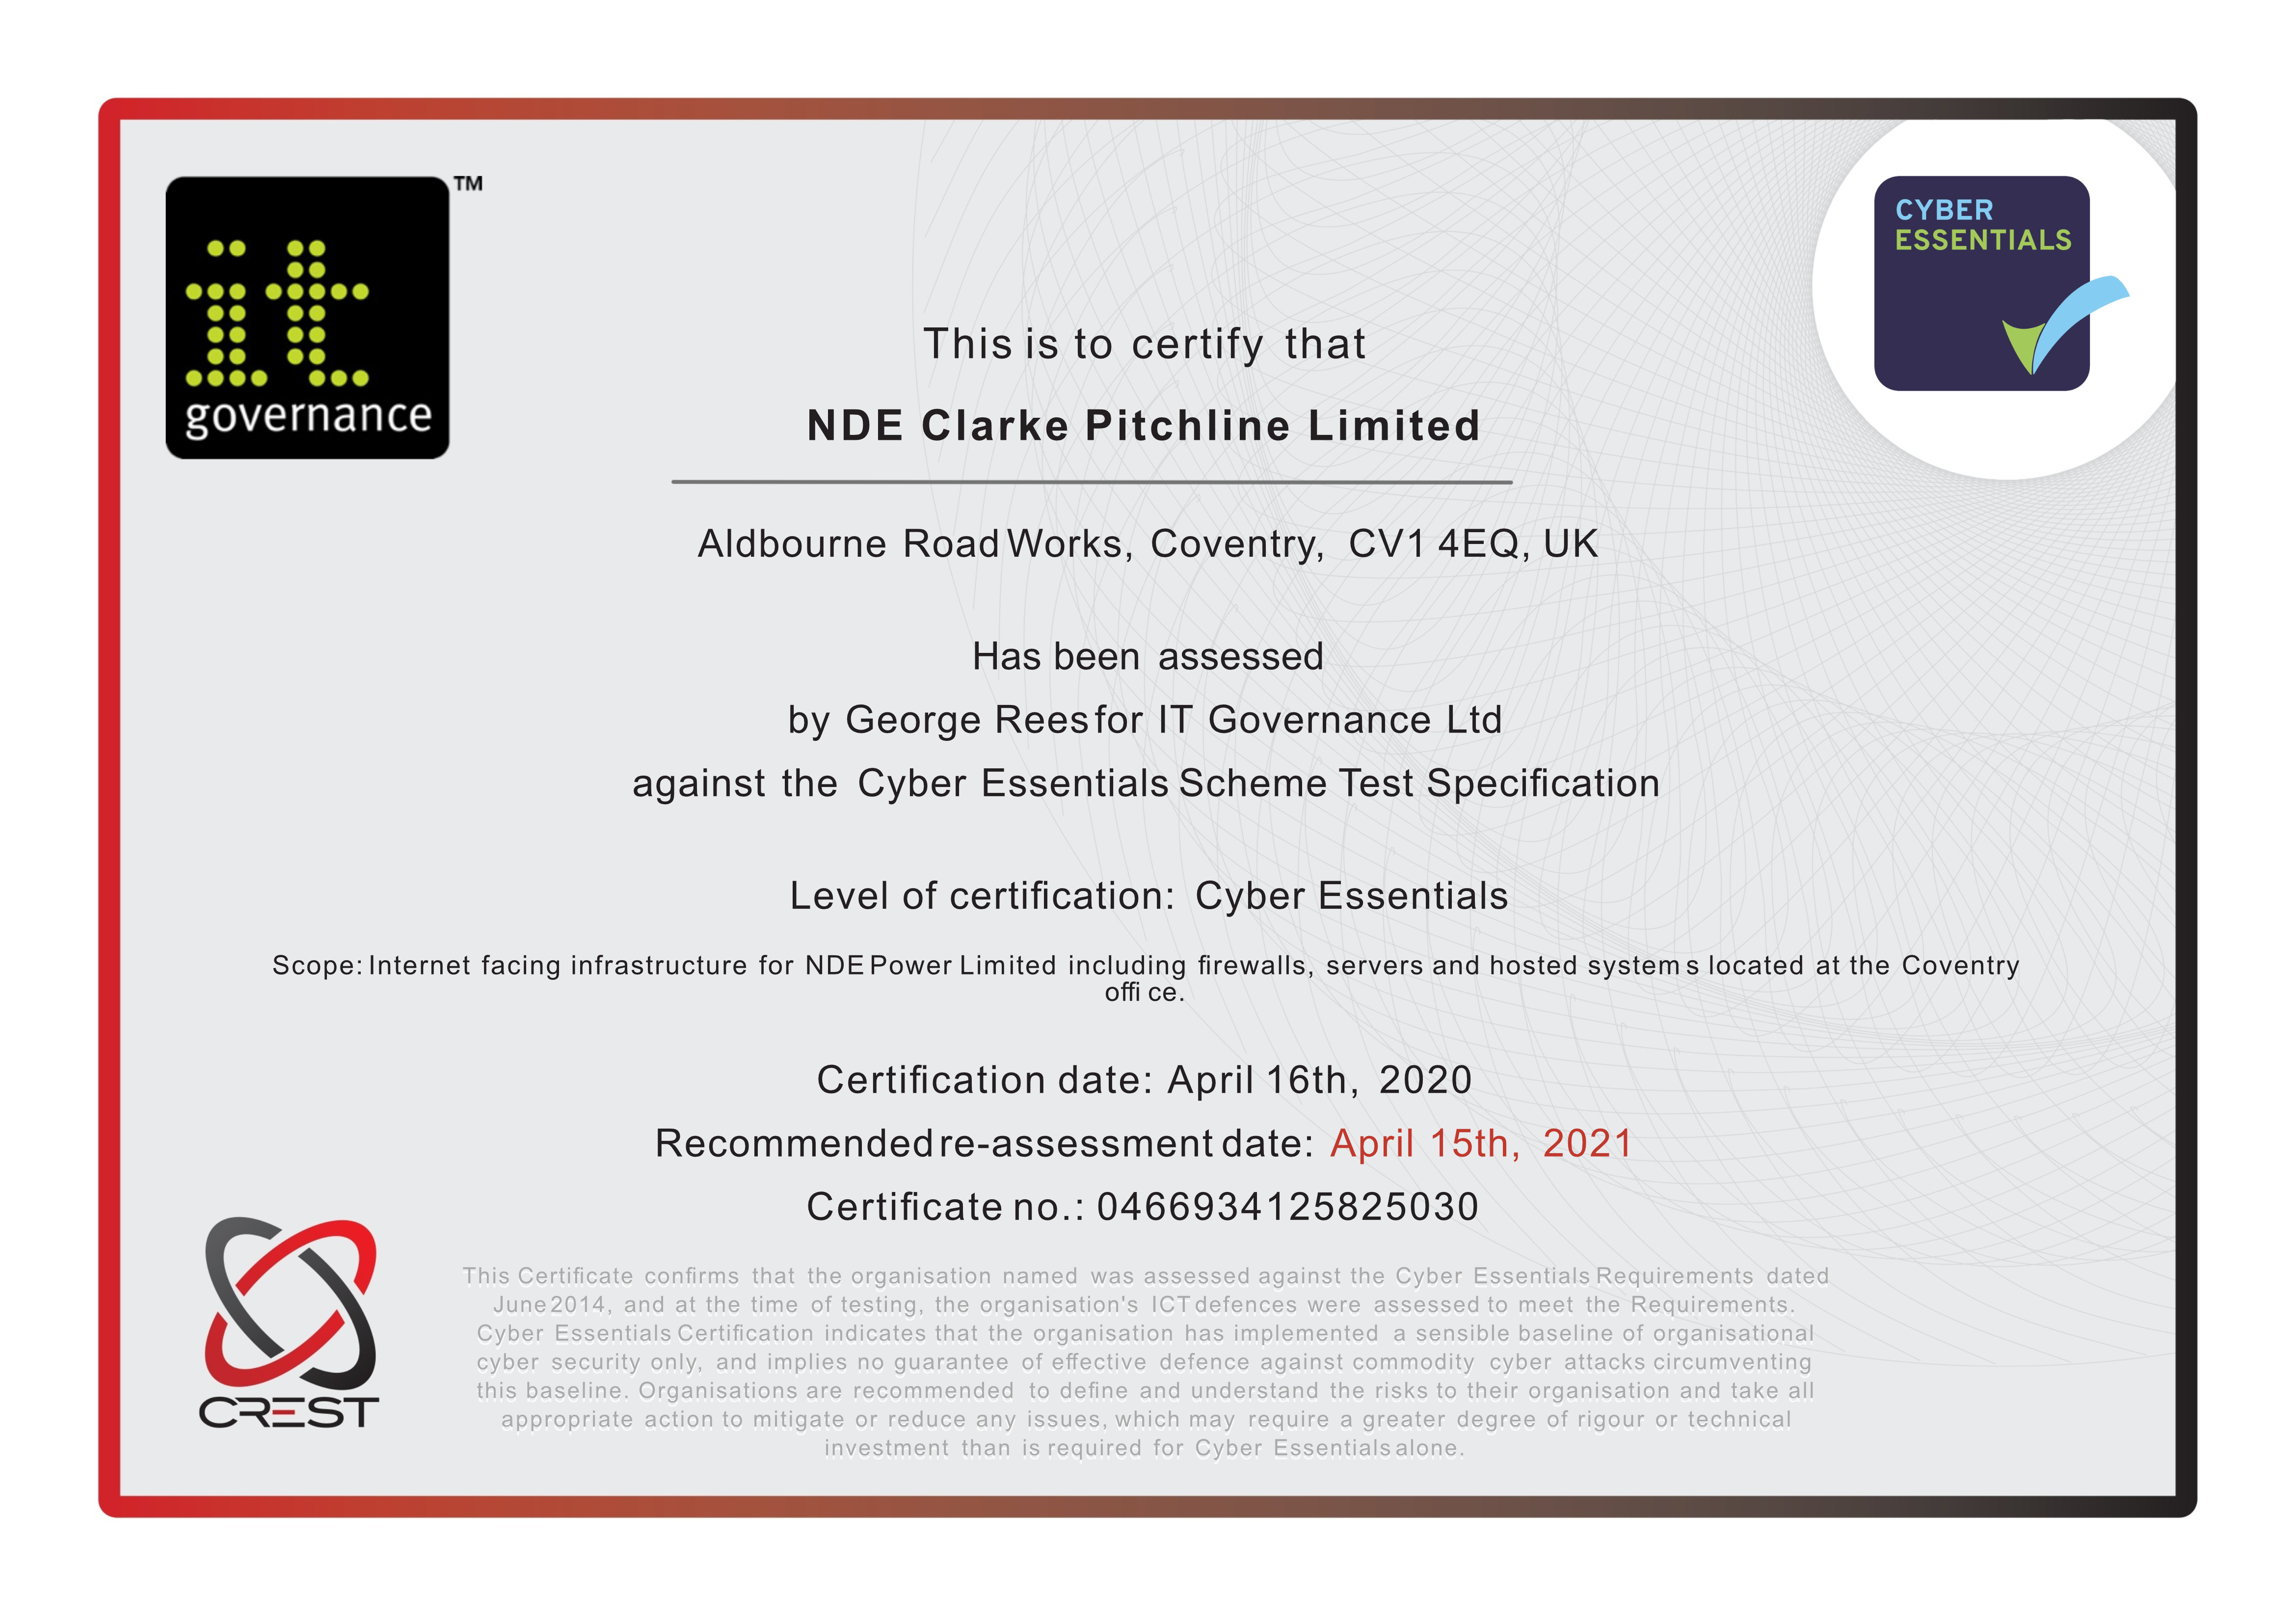 NDE's Cyber Essentials Certificate image